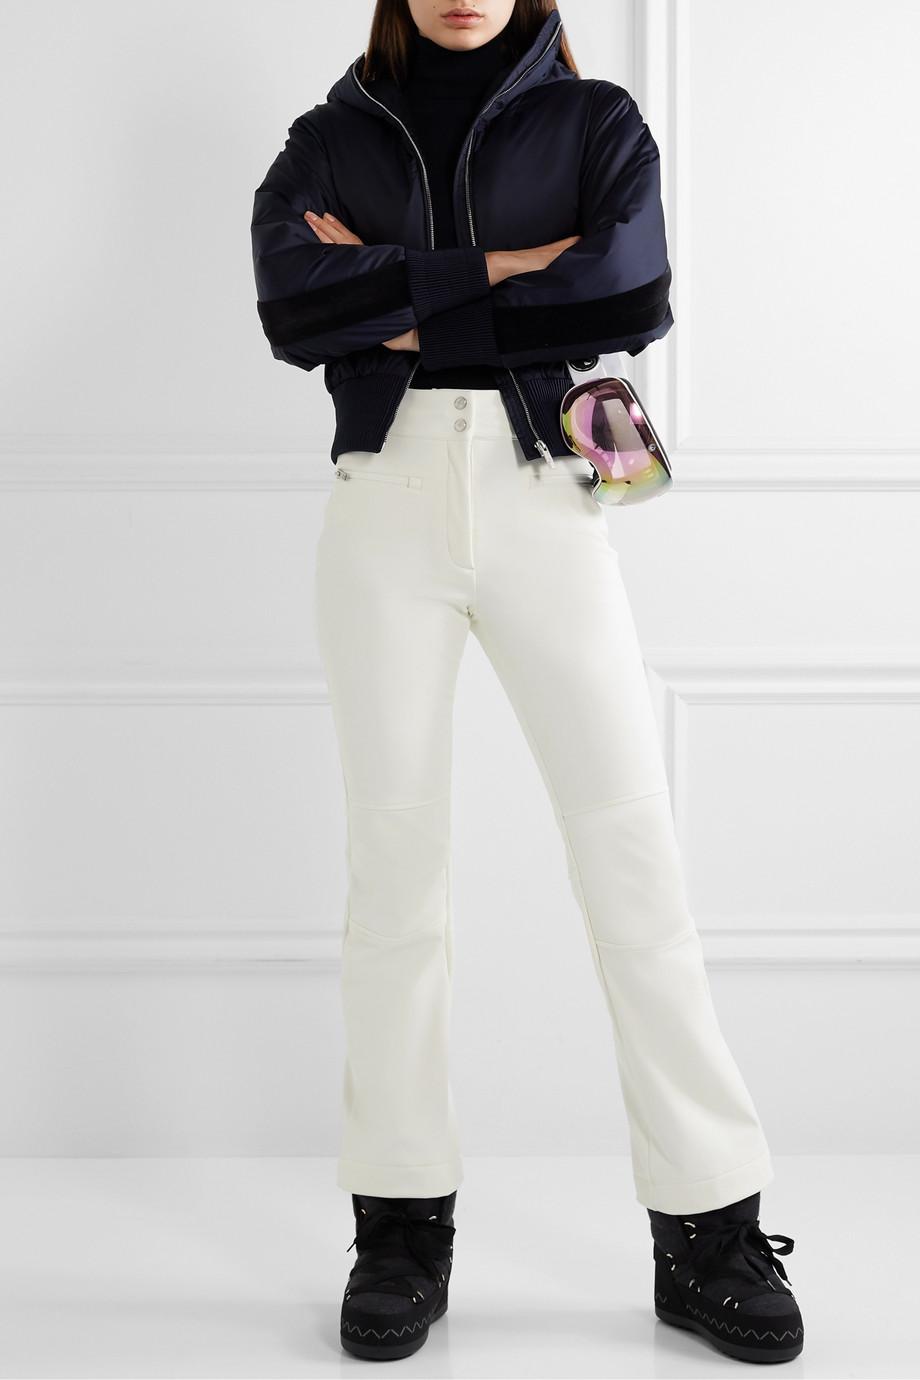 Fusalp Diana 滑雪裤